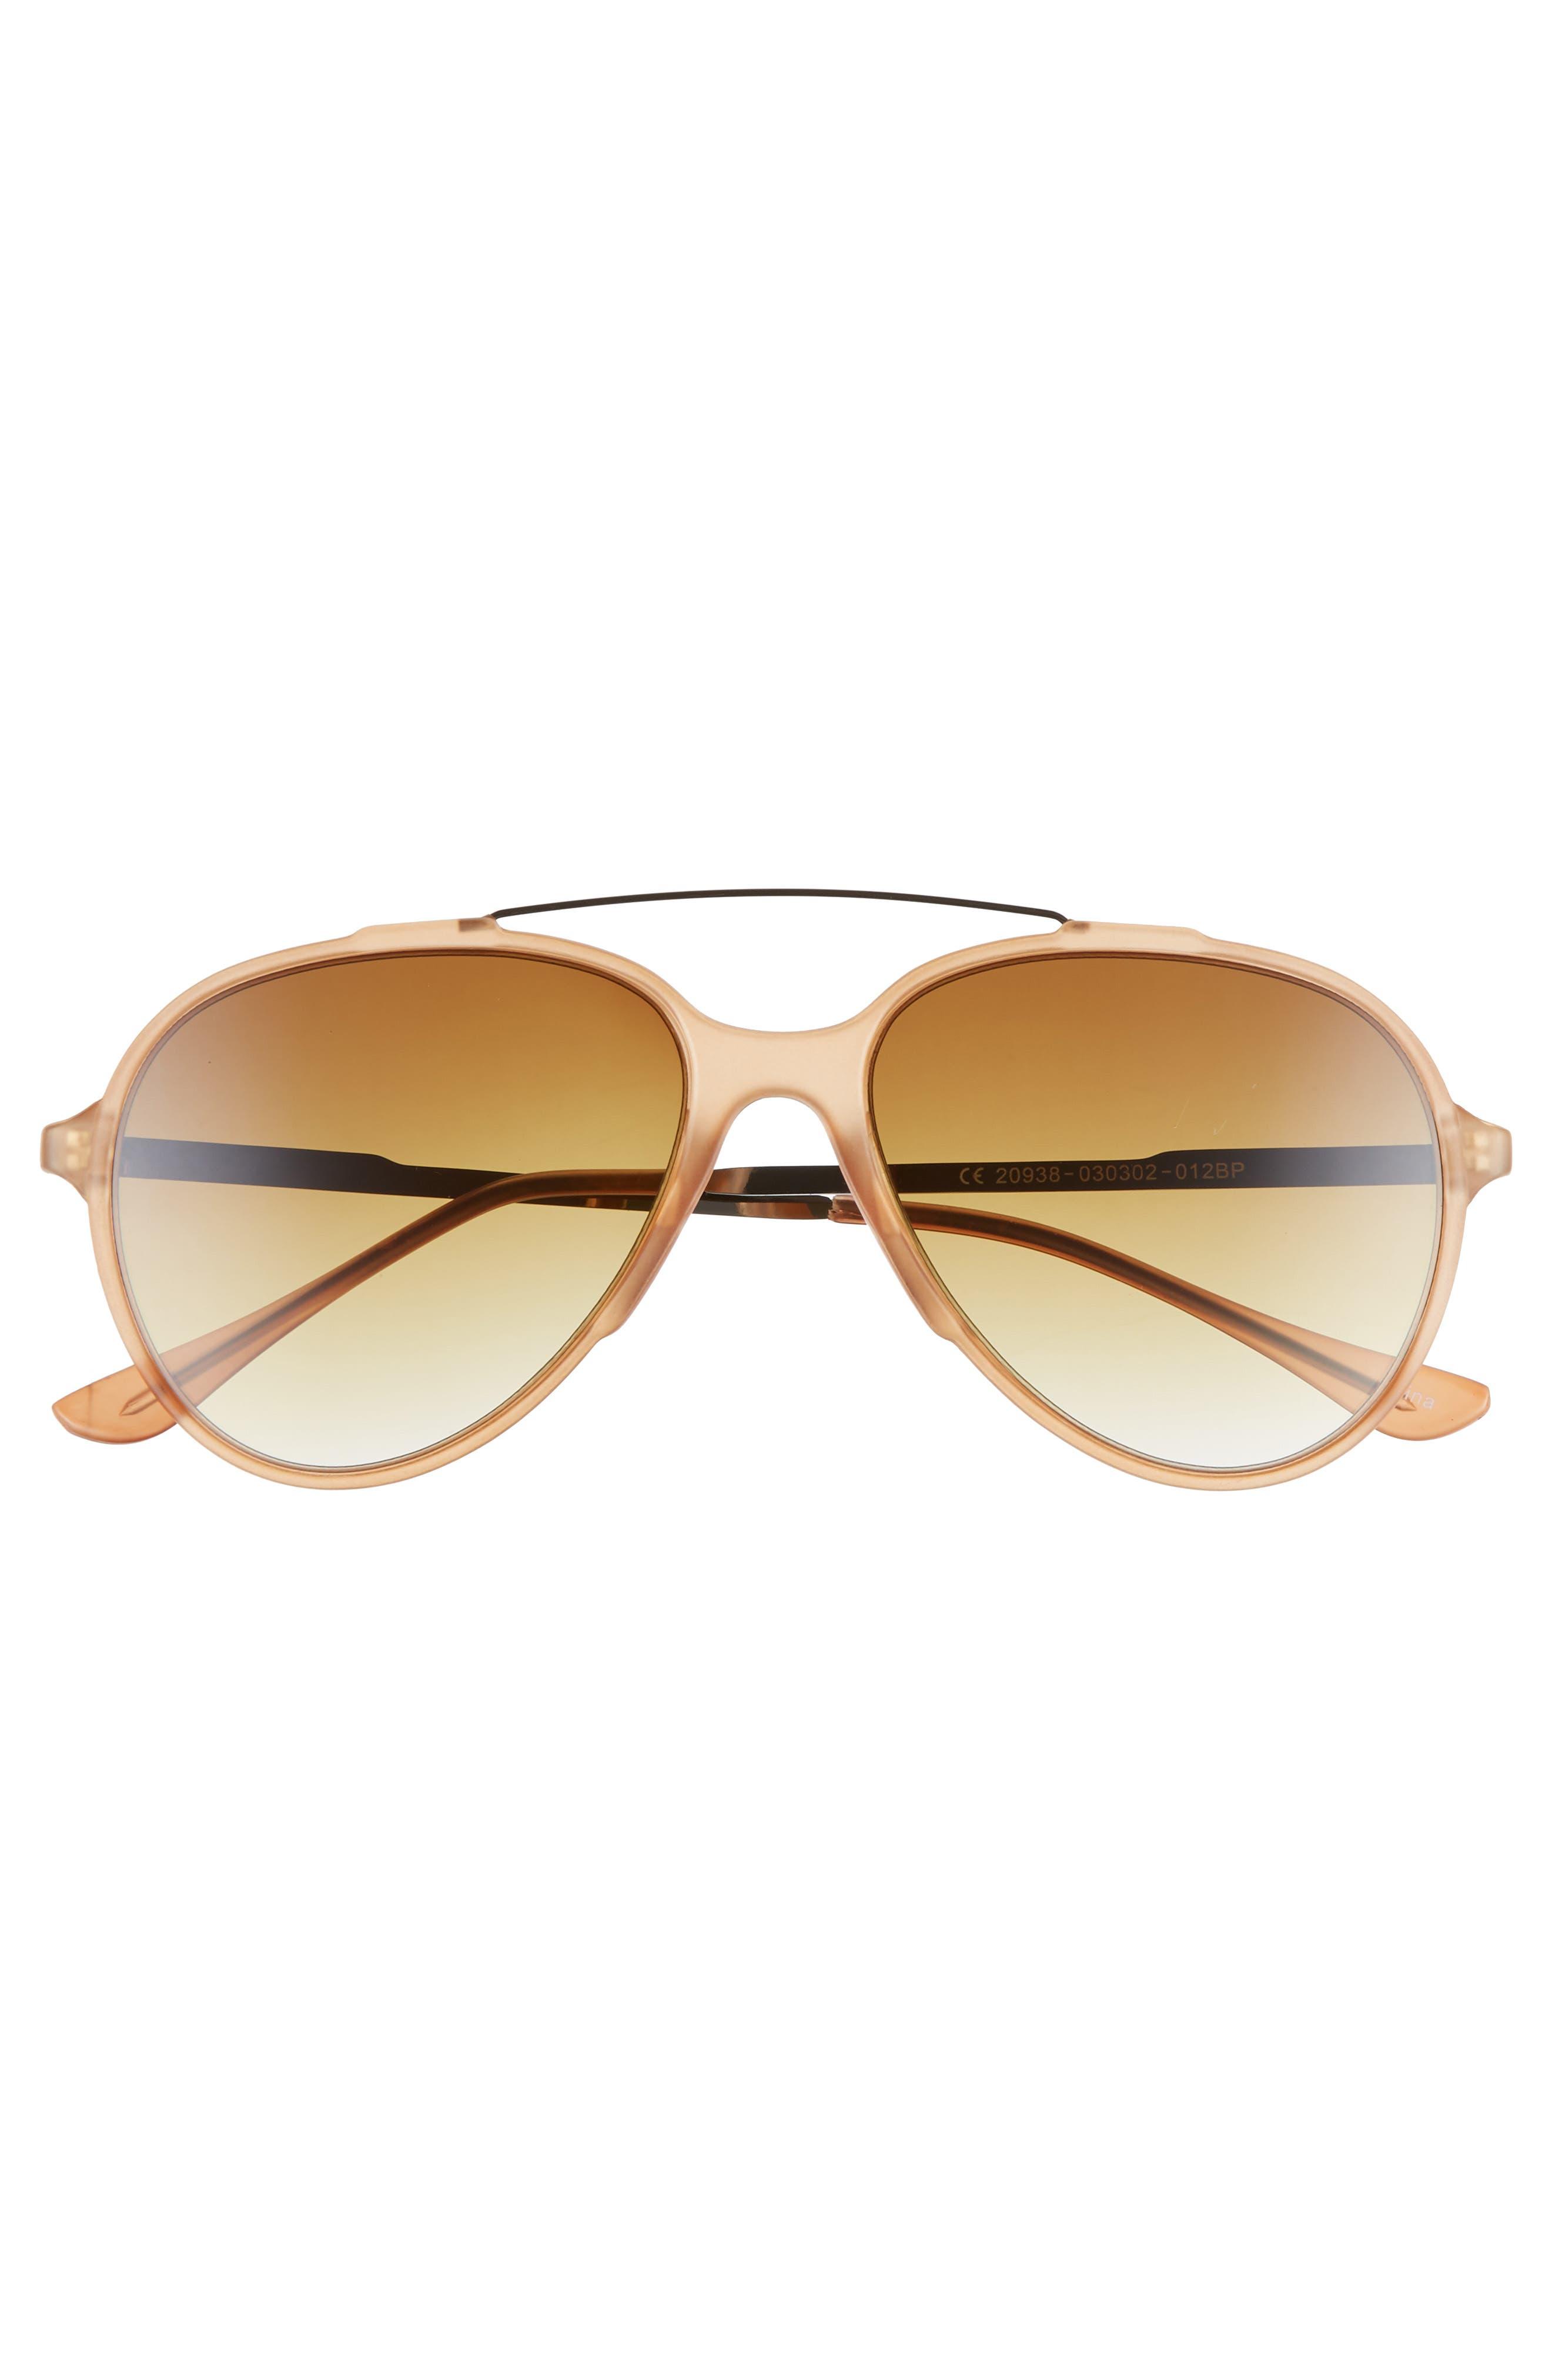 55mm Aviator Sunglasses,                             Alternate thumbnail 3, color,                             BROWN